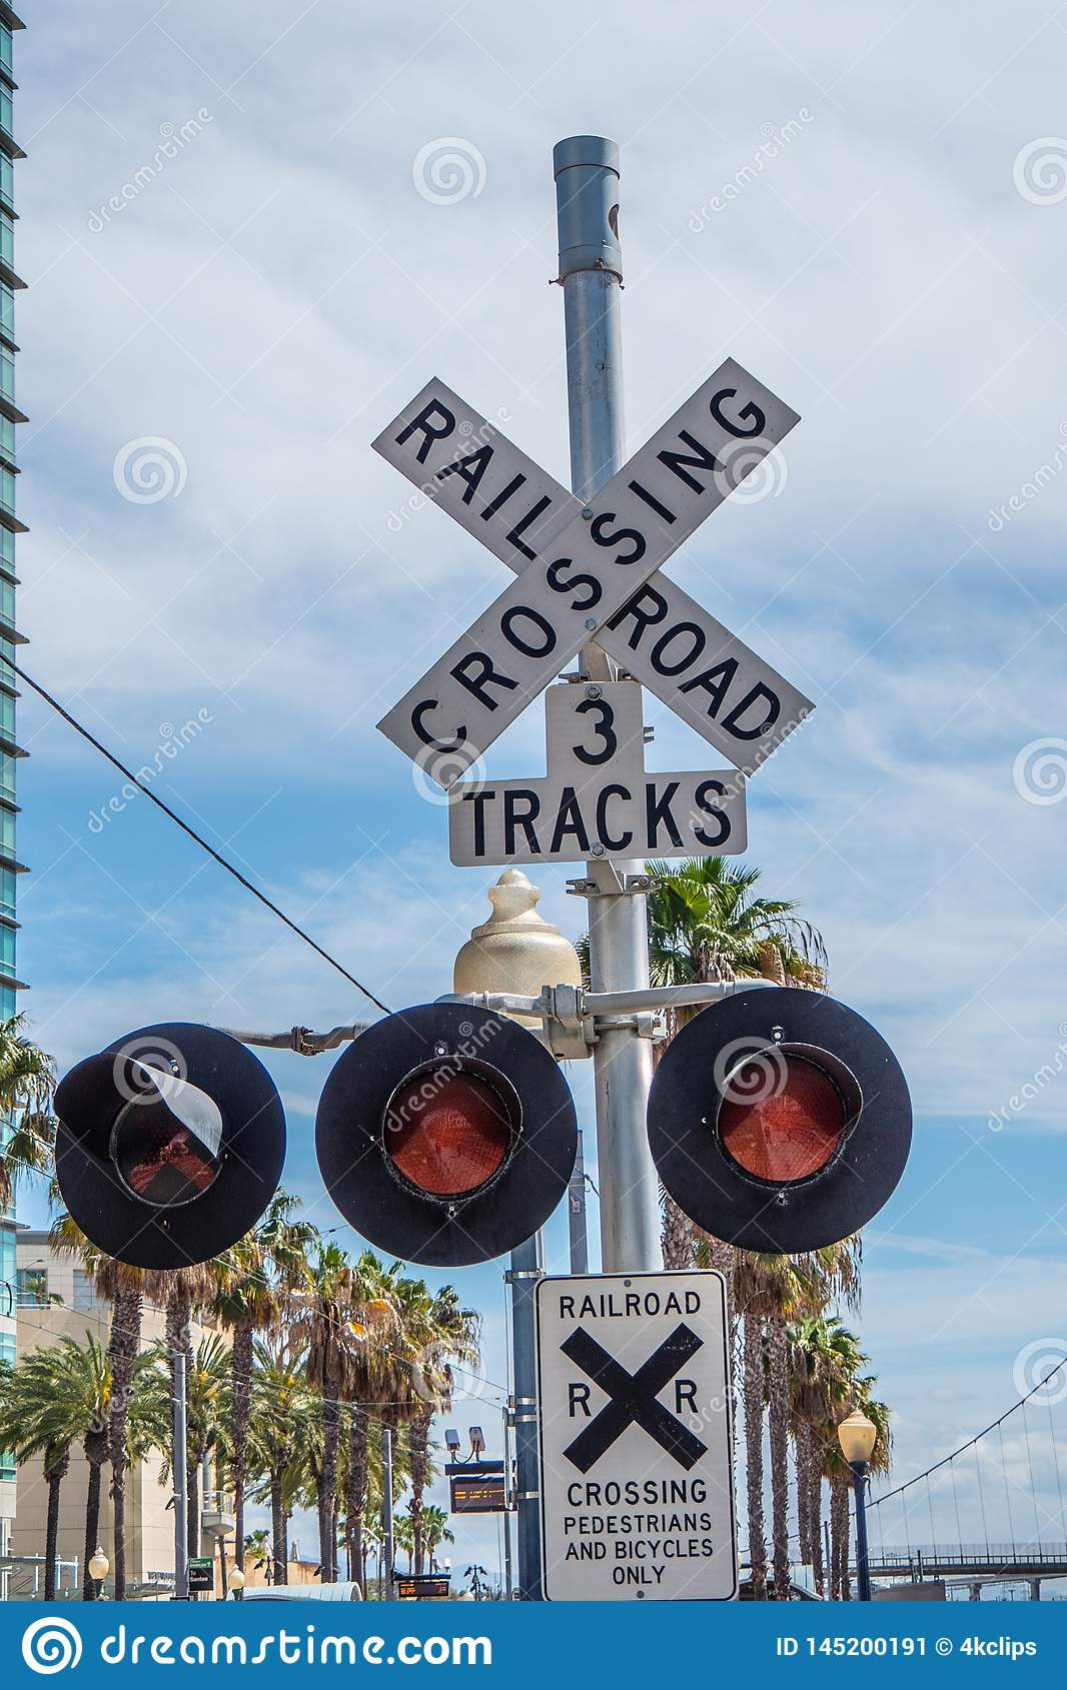 Rail tracks at San Diego Convention Center - CALIFORNIA, USA - MARCH 18, 2019